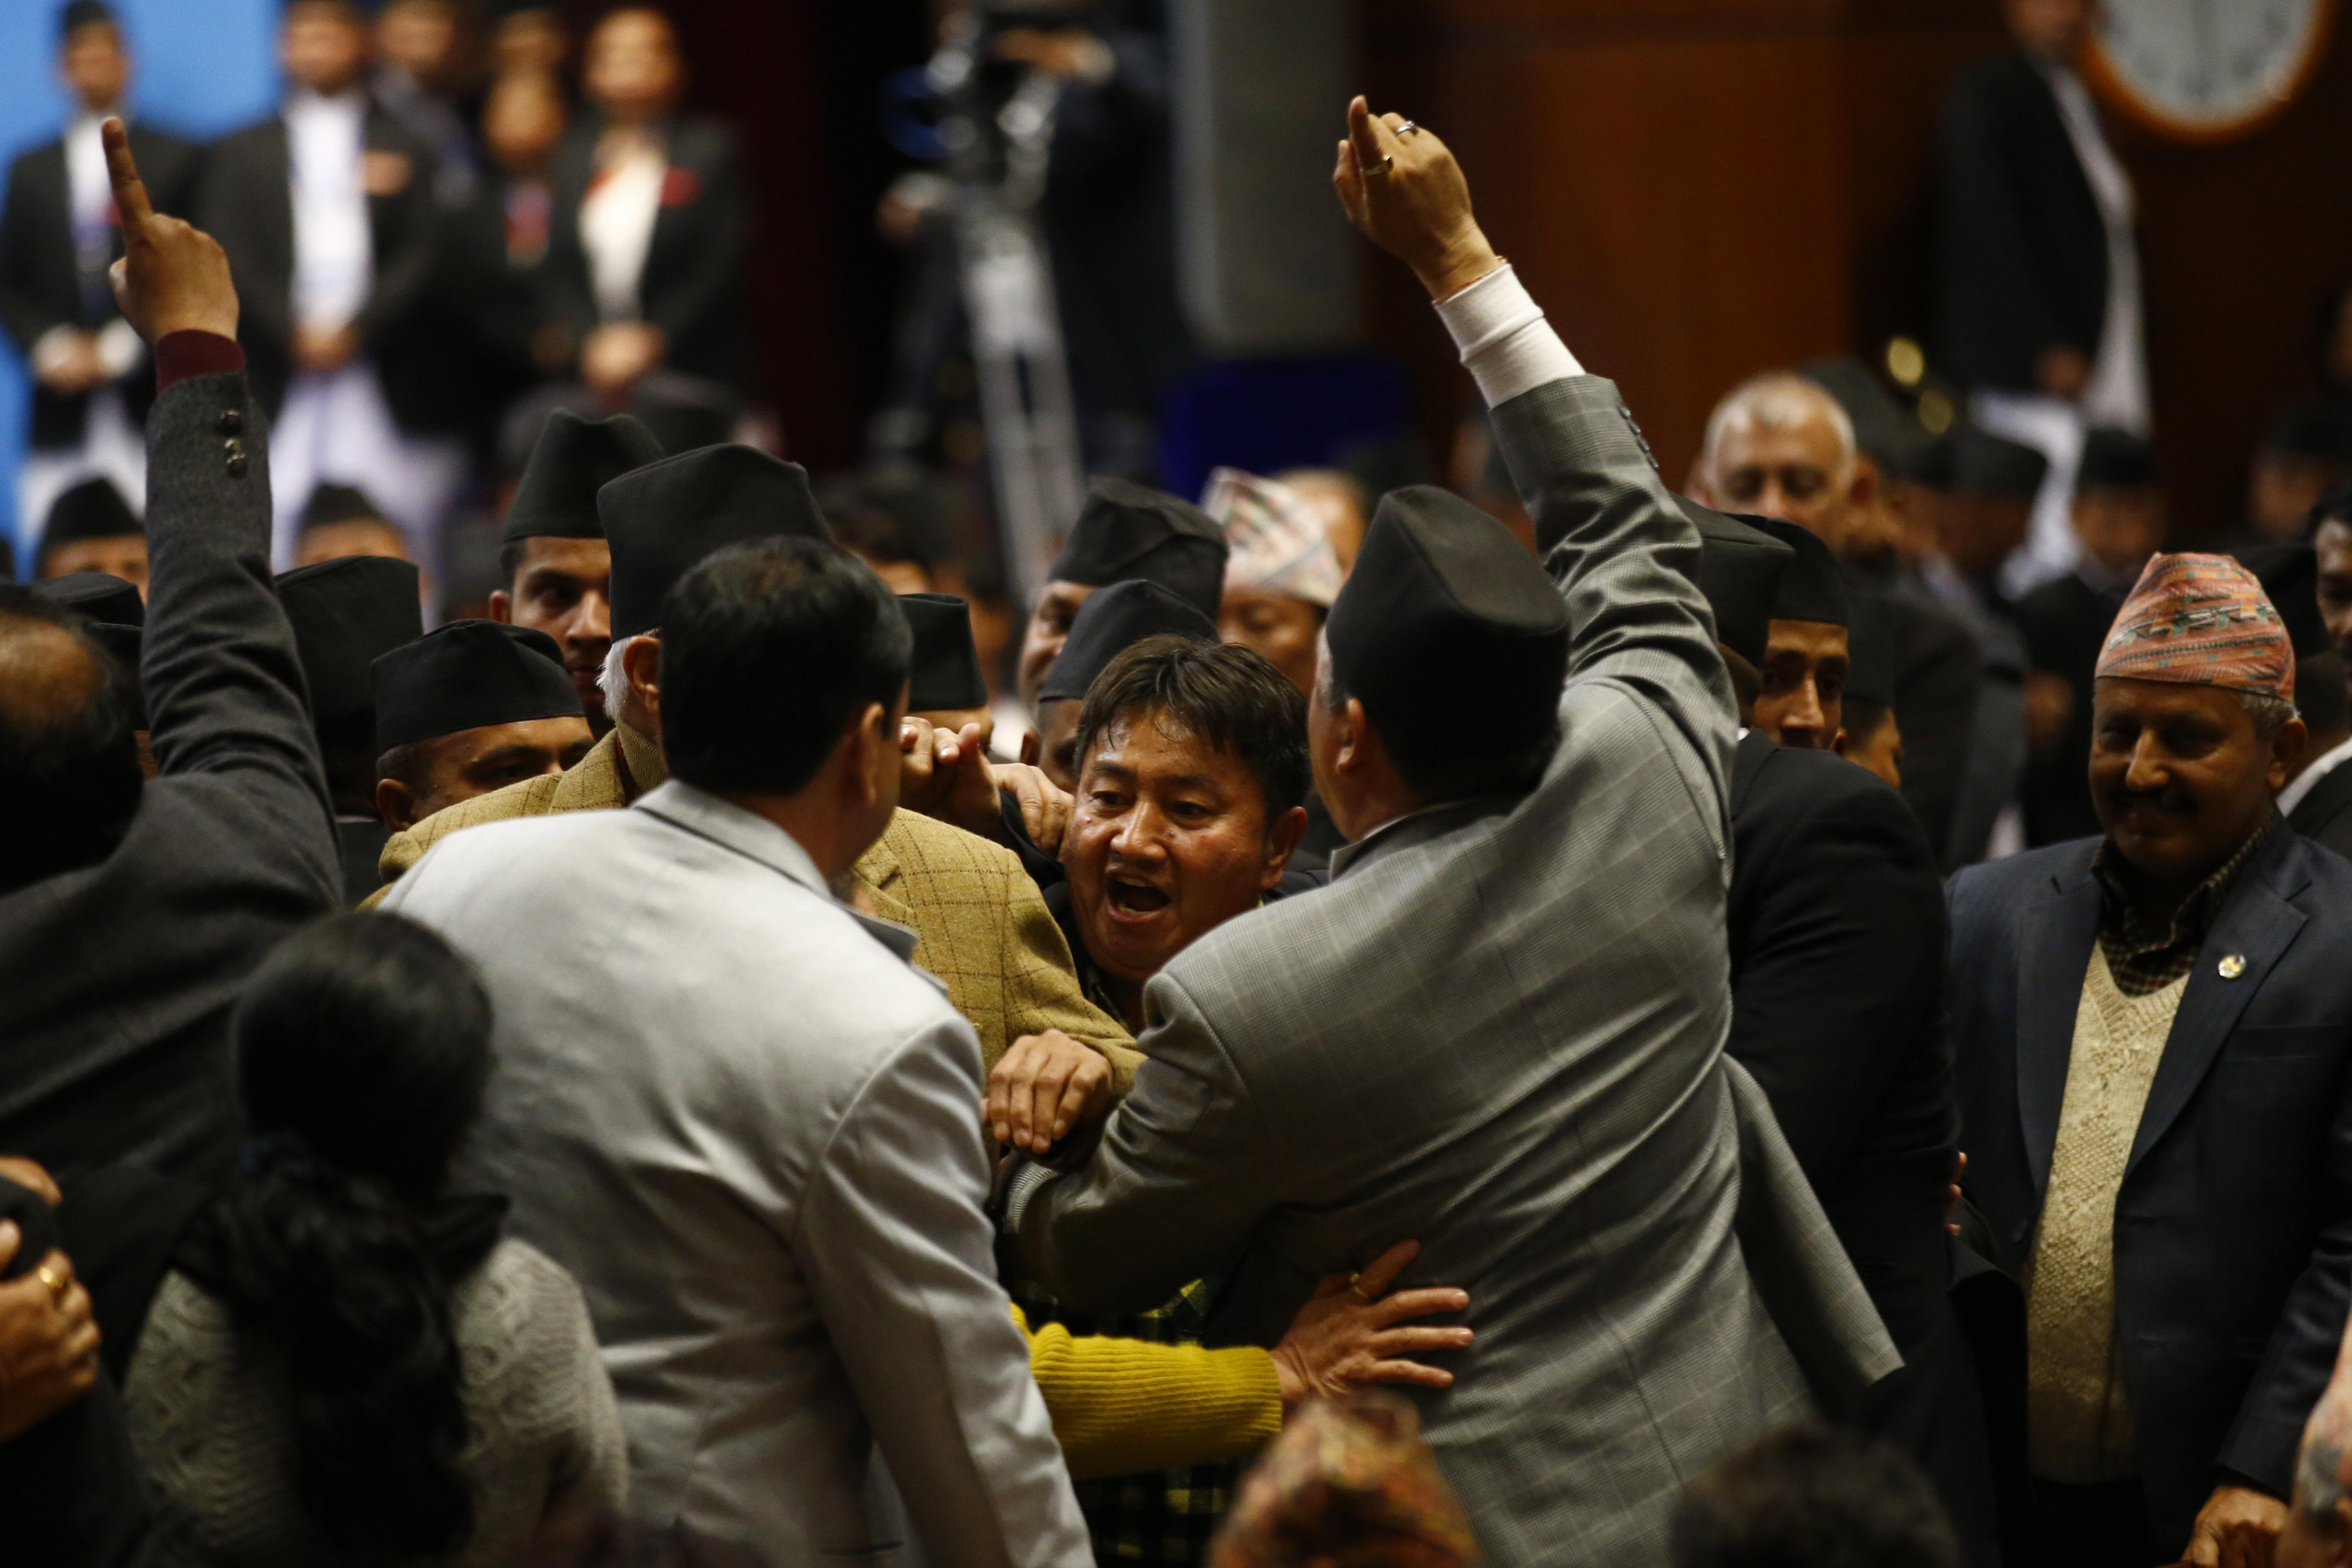 Nepali Congress lawmakers shout slogans in the well of the House of Representatives in Kathmandu, Nepal on Friday, January 25, 2019.nPhoto/Skanda Gautam